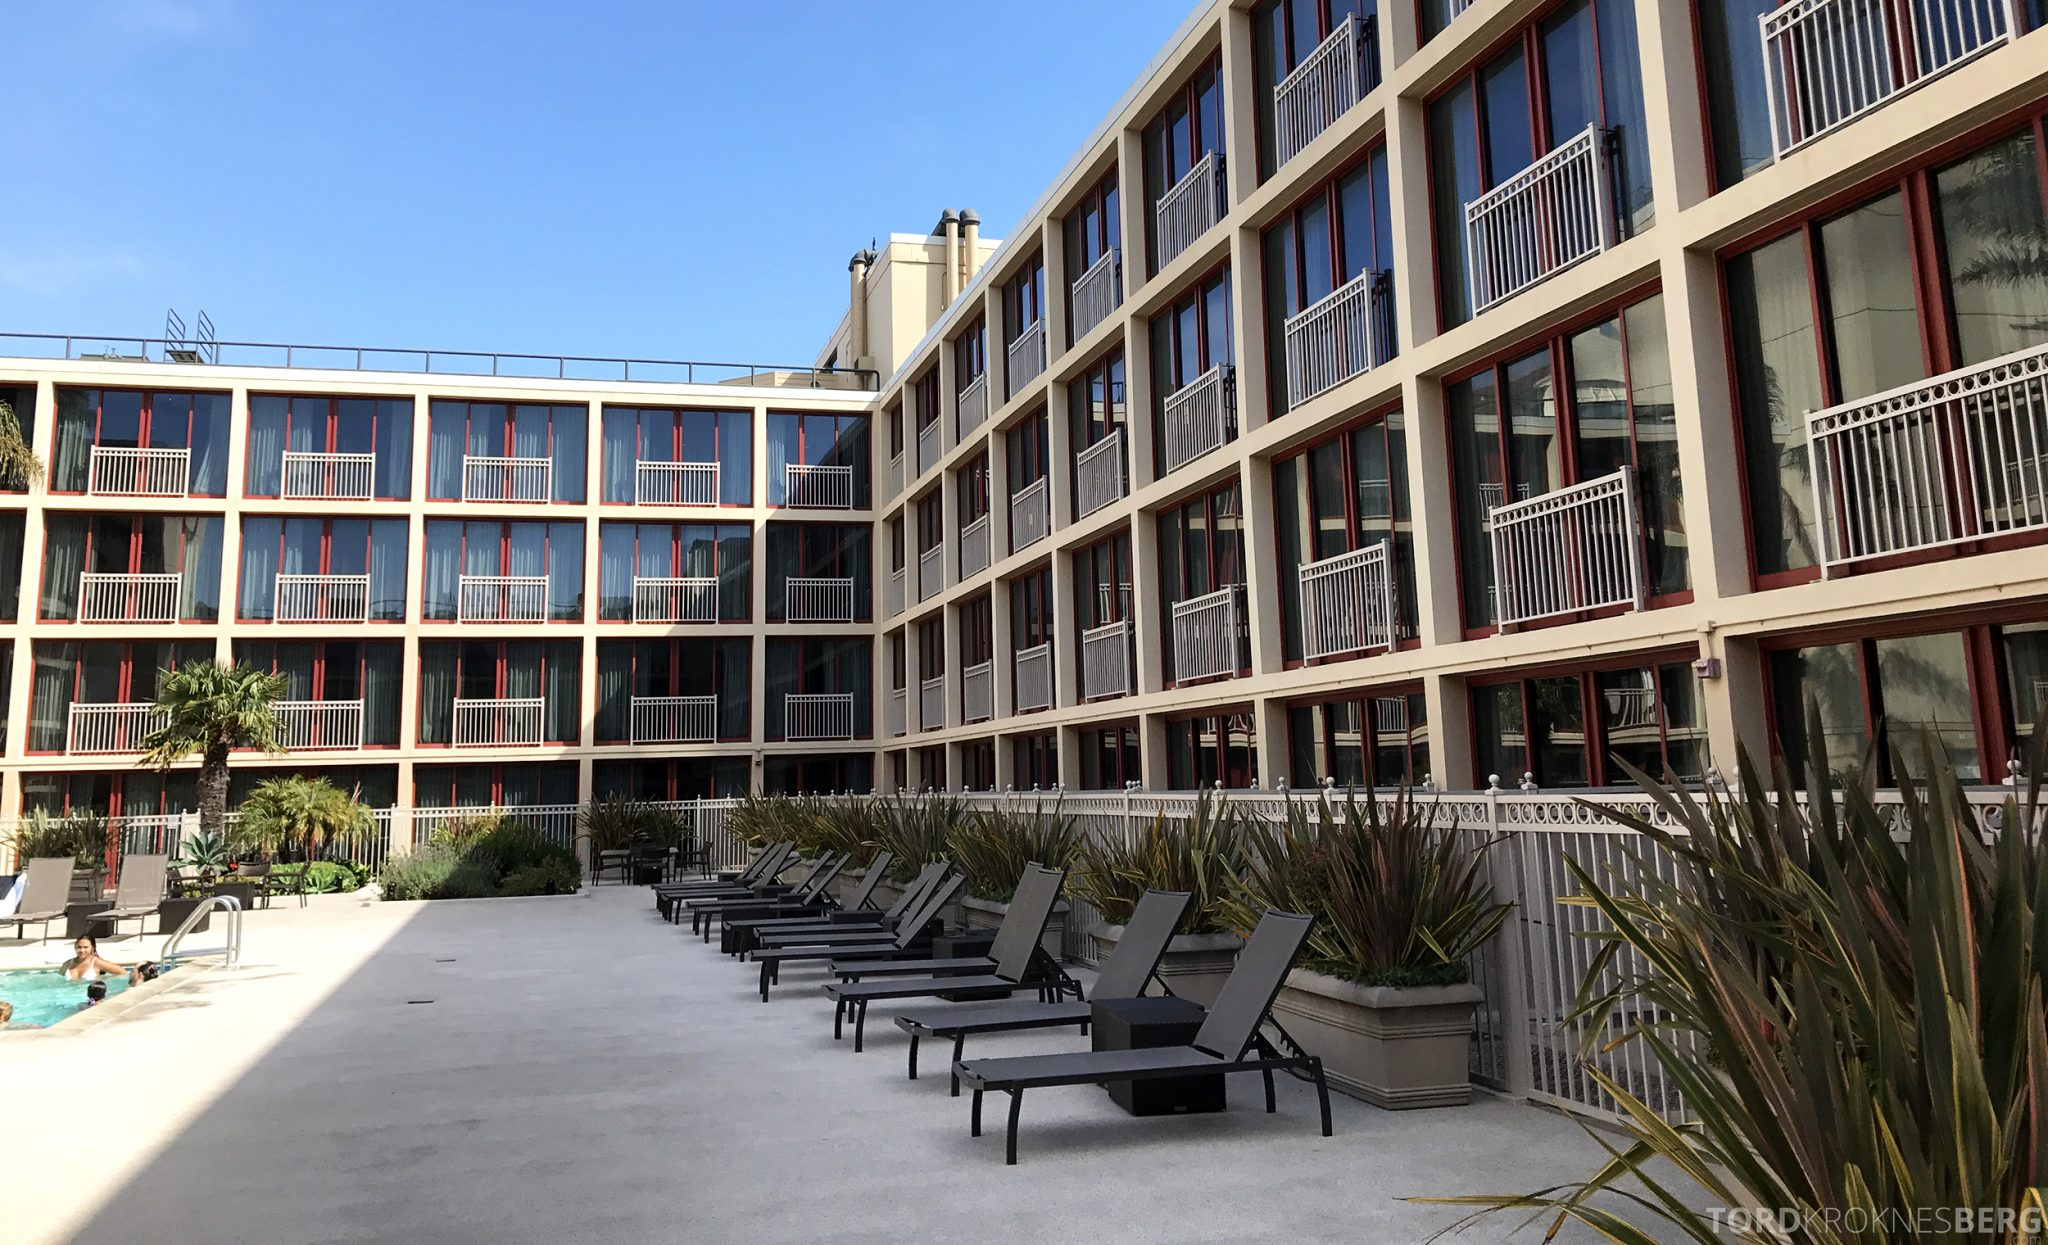 Hilton San Francisco Hotel solstoler